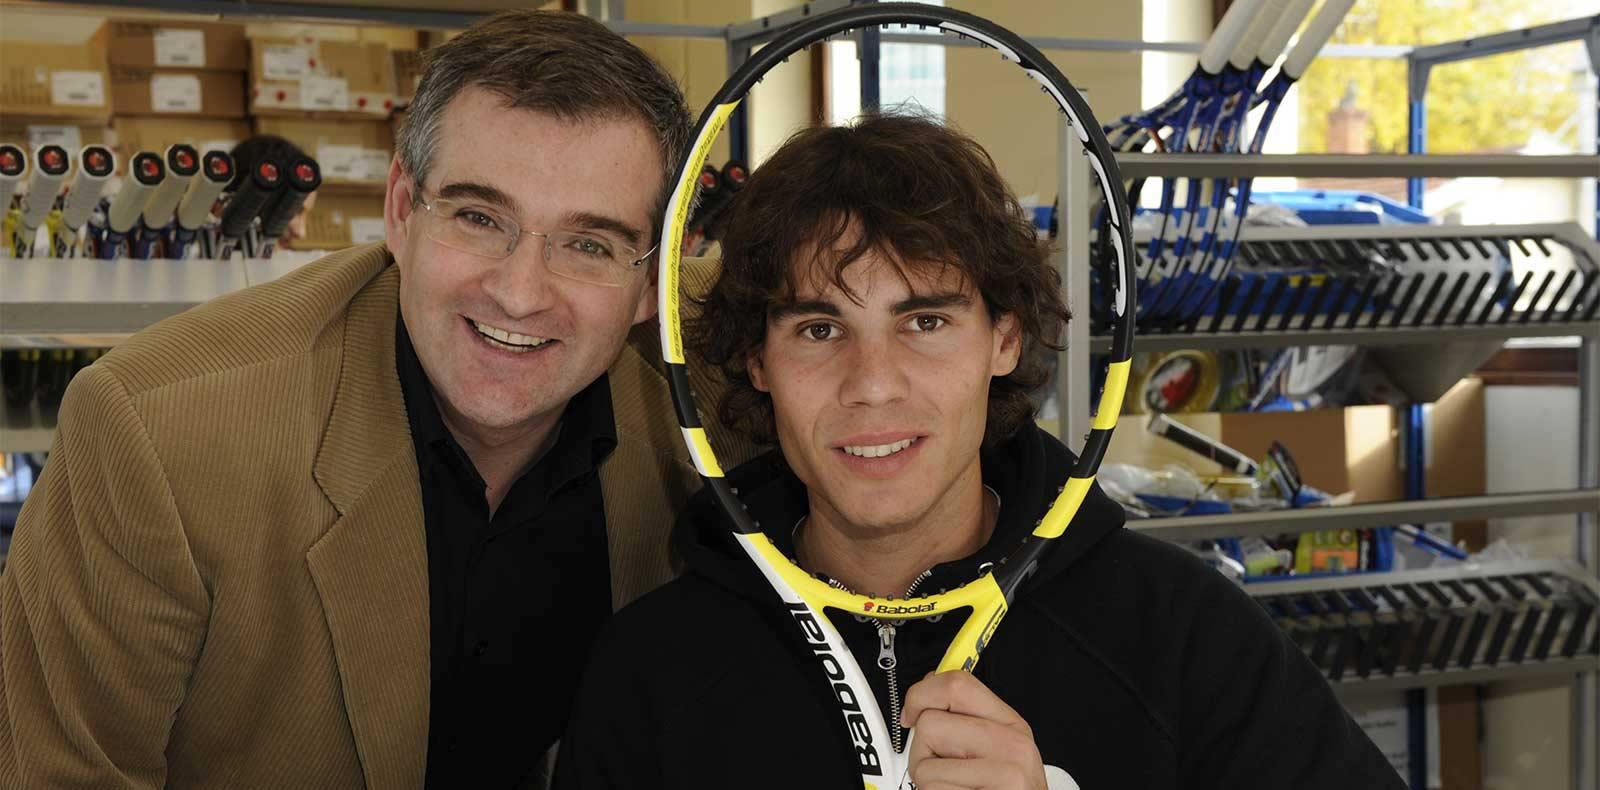 Eric Babolat and Rafael Nadal 2006